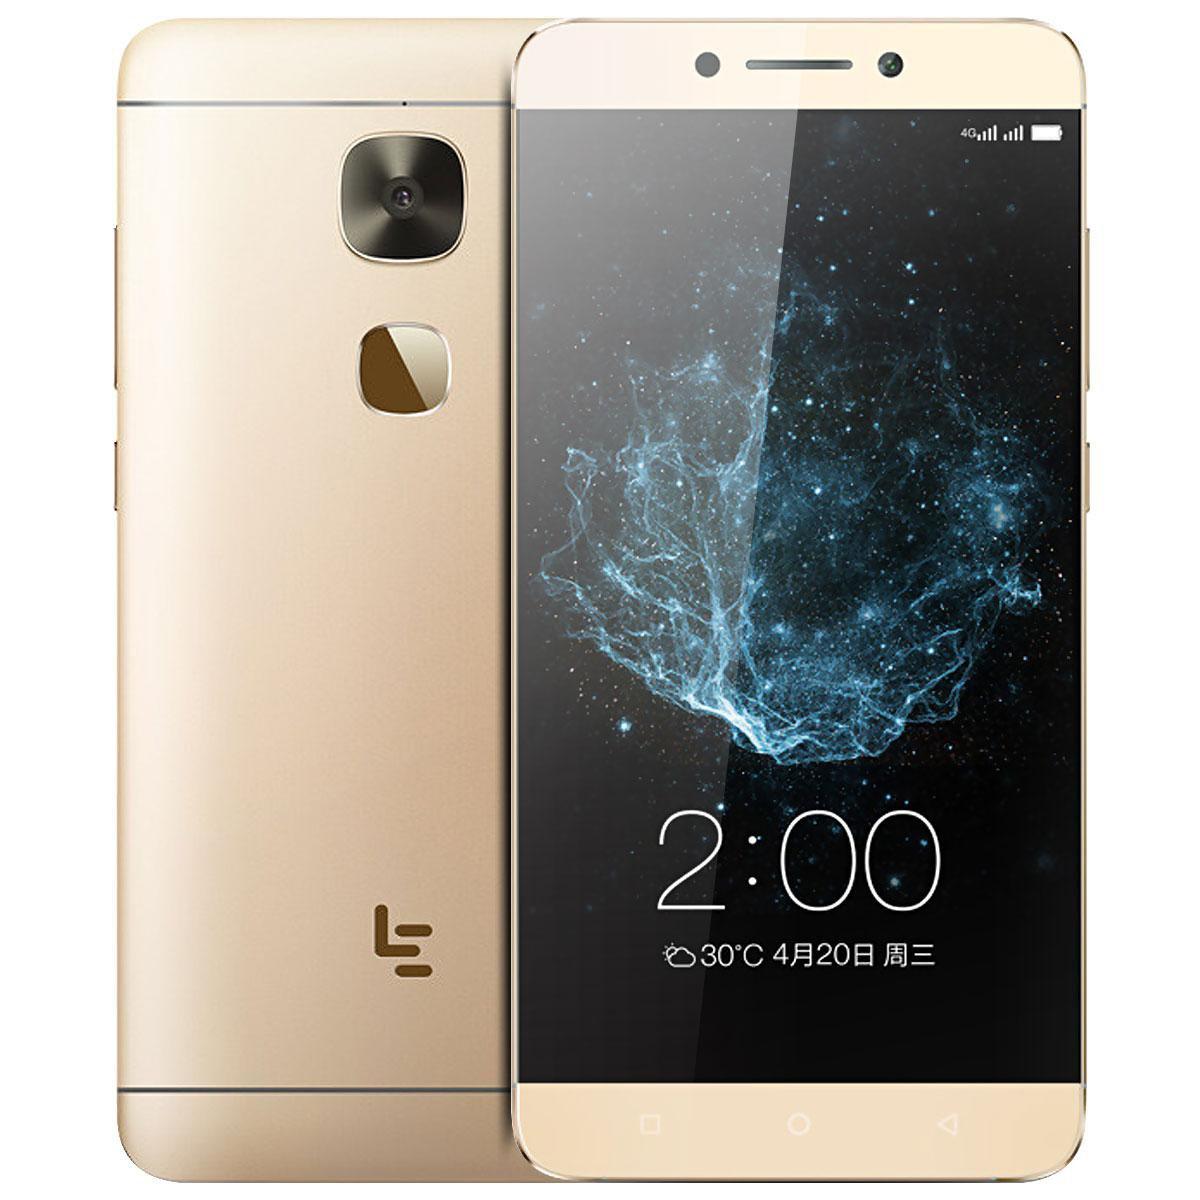 LeTV LeEco 4G Android 6 phone - 5.5 Inch FHD, Fingerpring Sensor, Octa-Core, 3GB RAM, Dual-Band Wifi